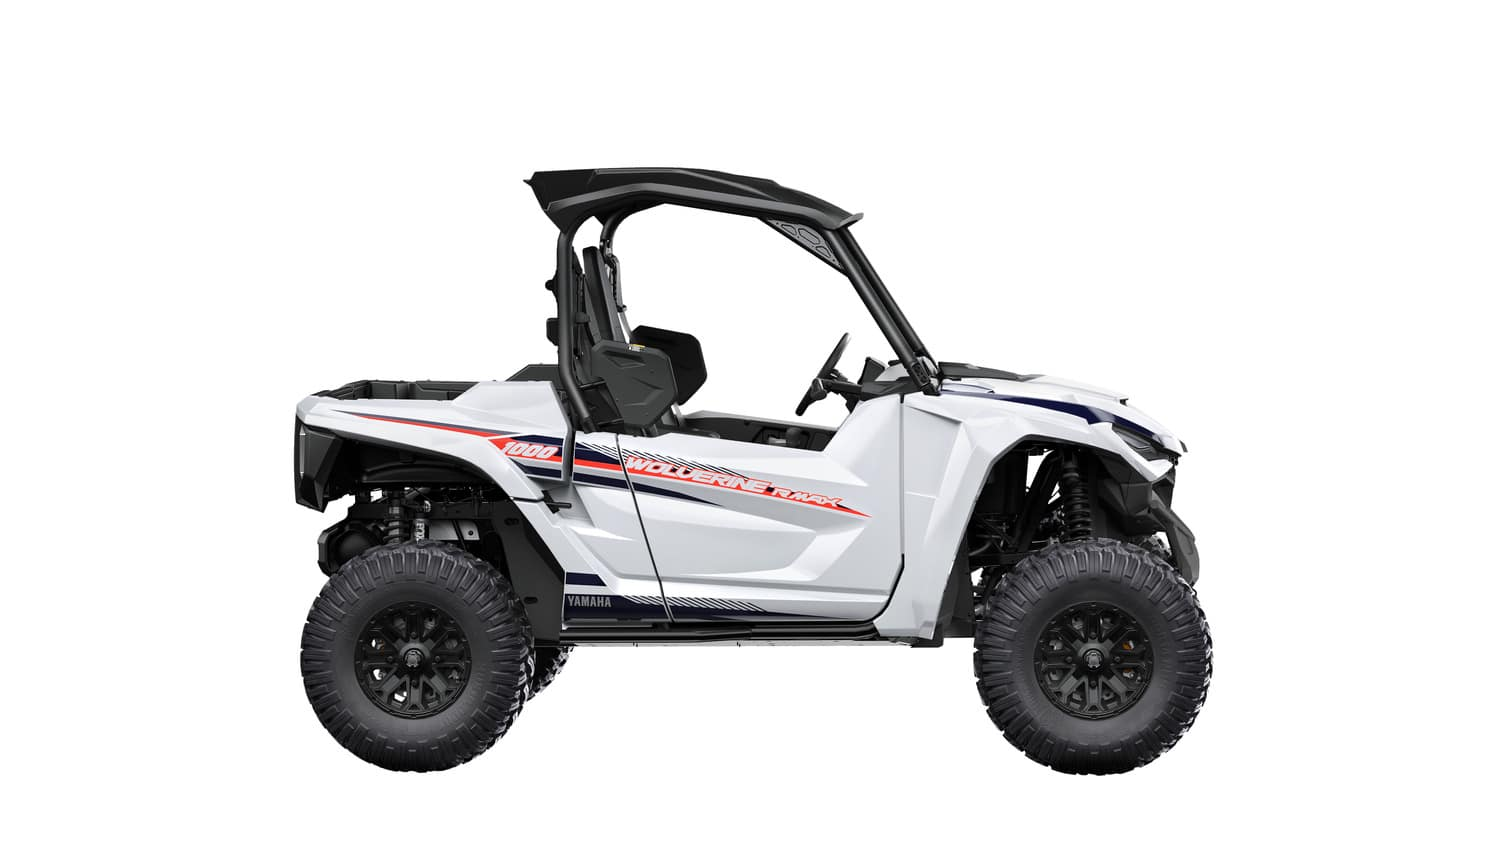 Yepyeni 2021 Yamaha Rmax 1000 Dirt Wheels Dergisi